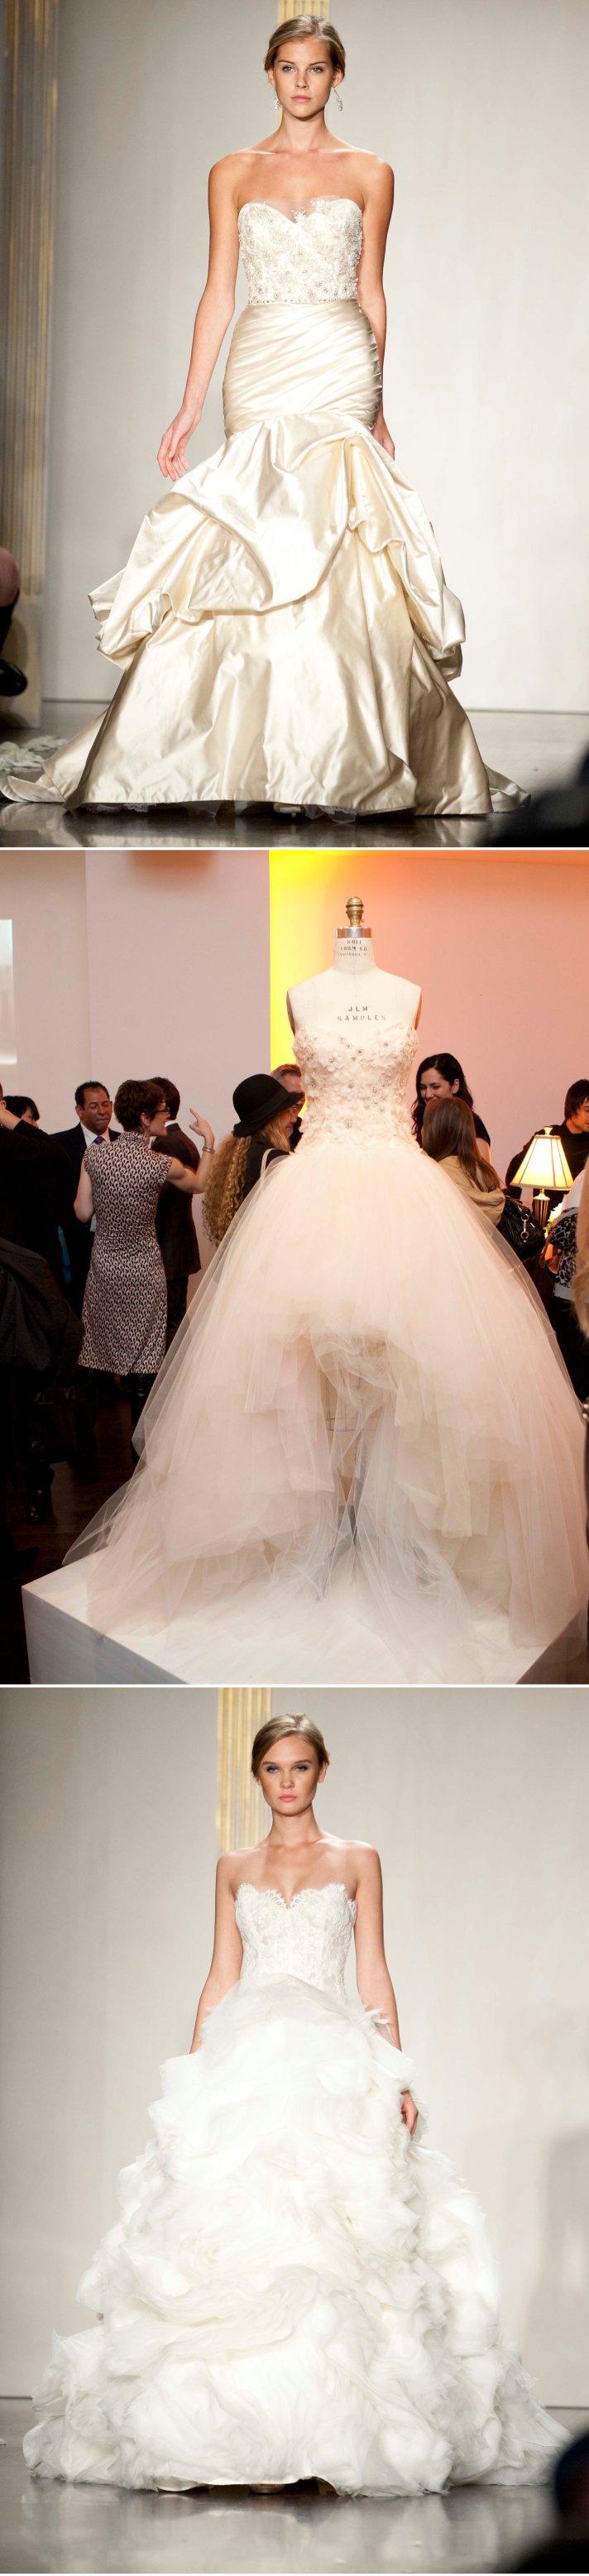 2012 wedding dresses bridal corset gown lazaro